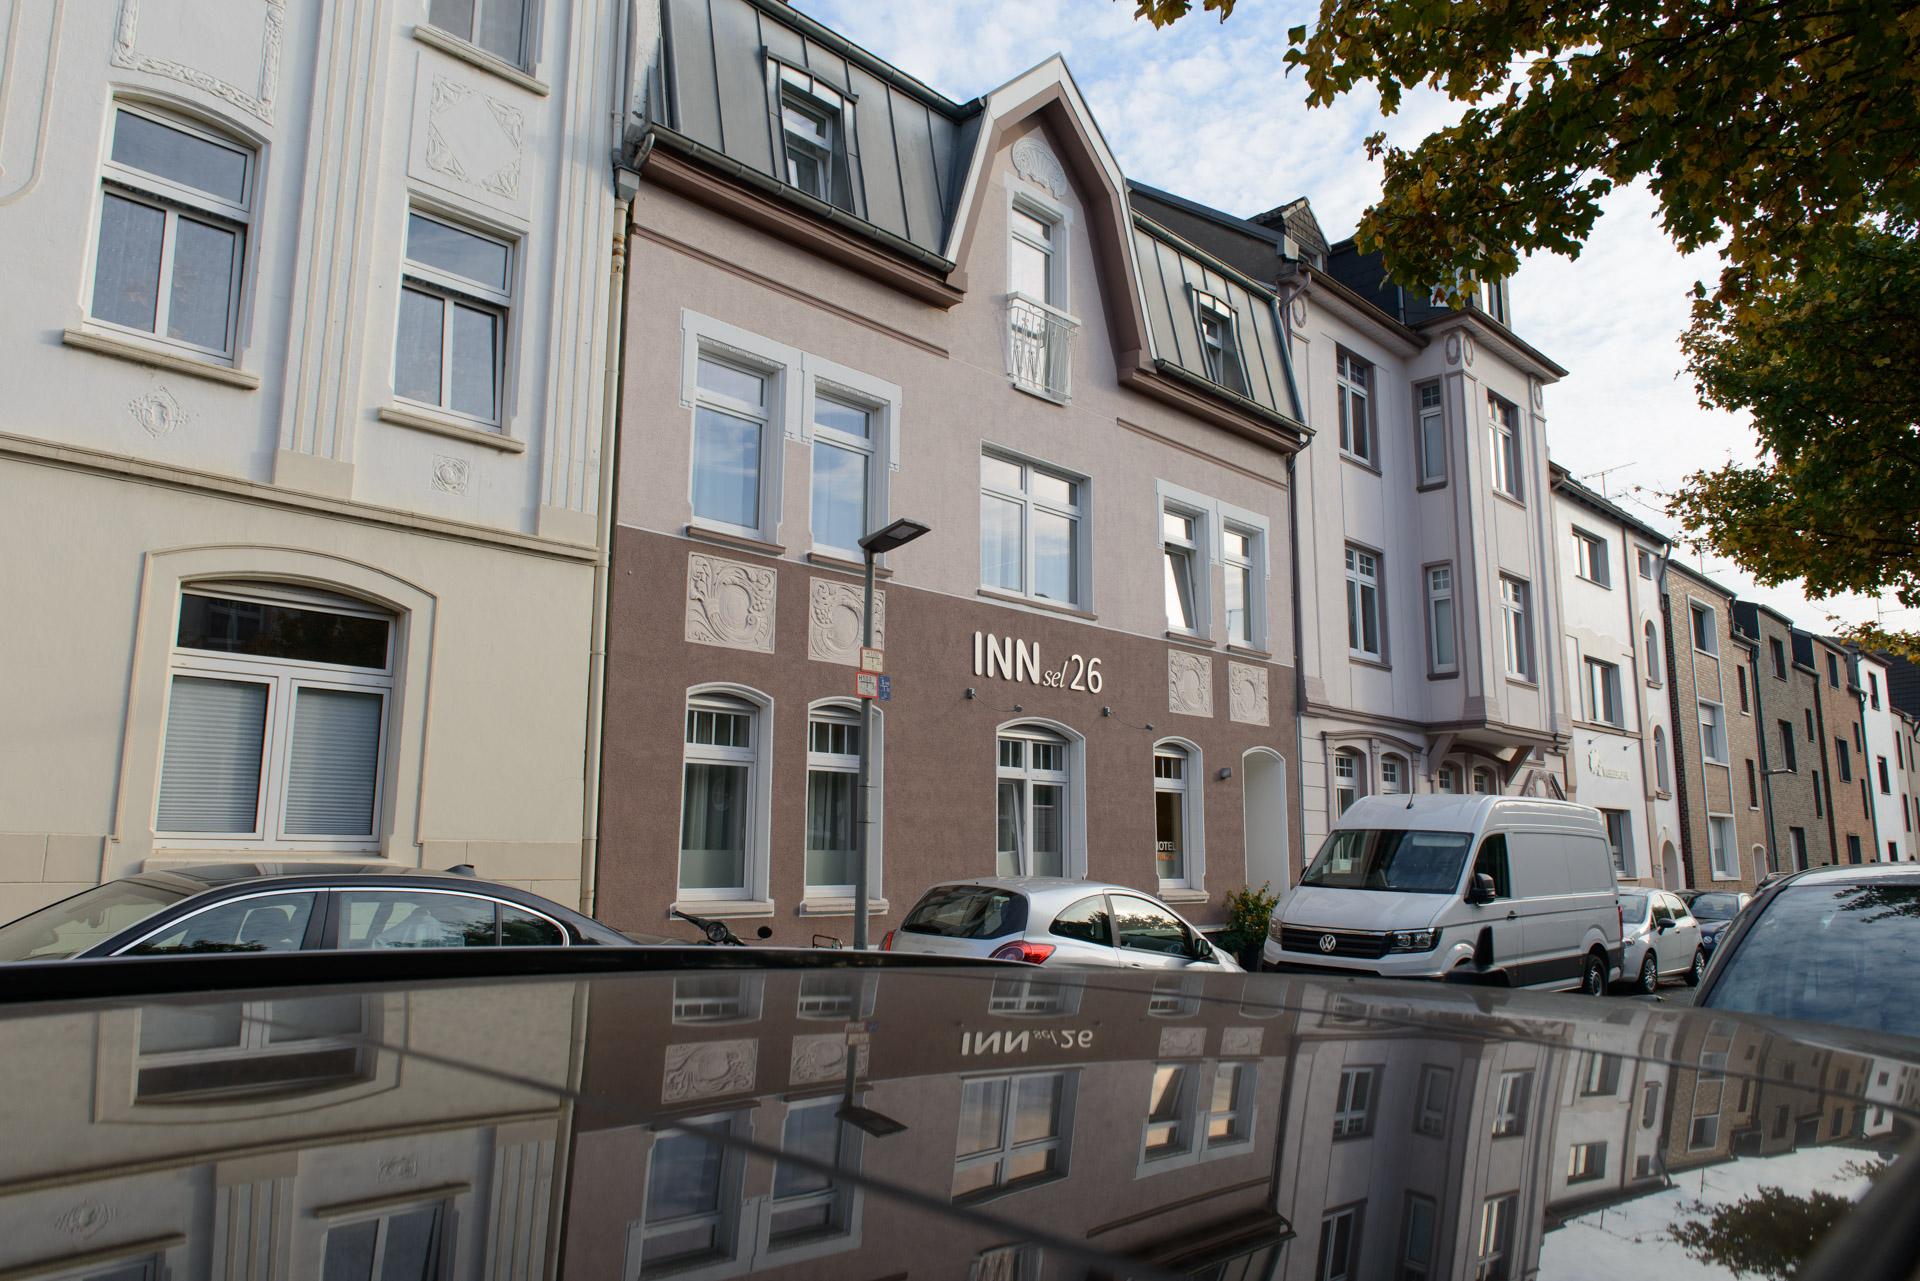 Ruhig gelegenes Stadthaus in Oberhausen-Sterkrade